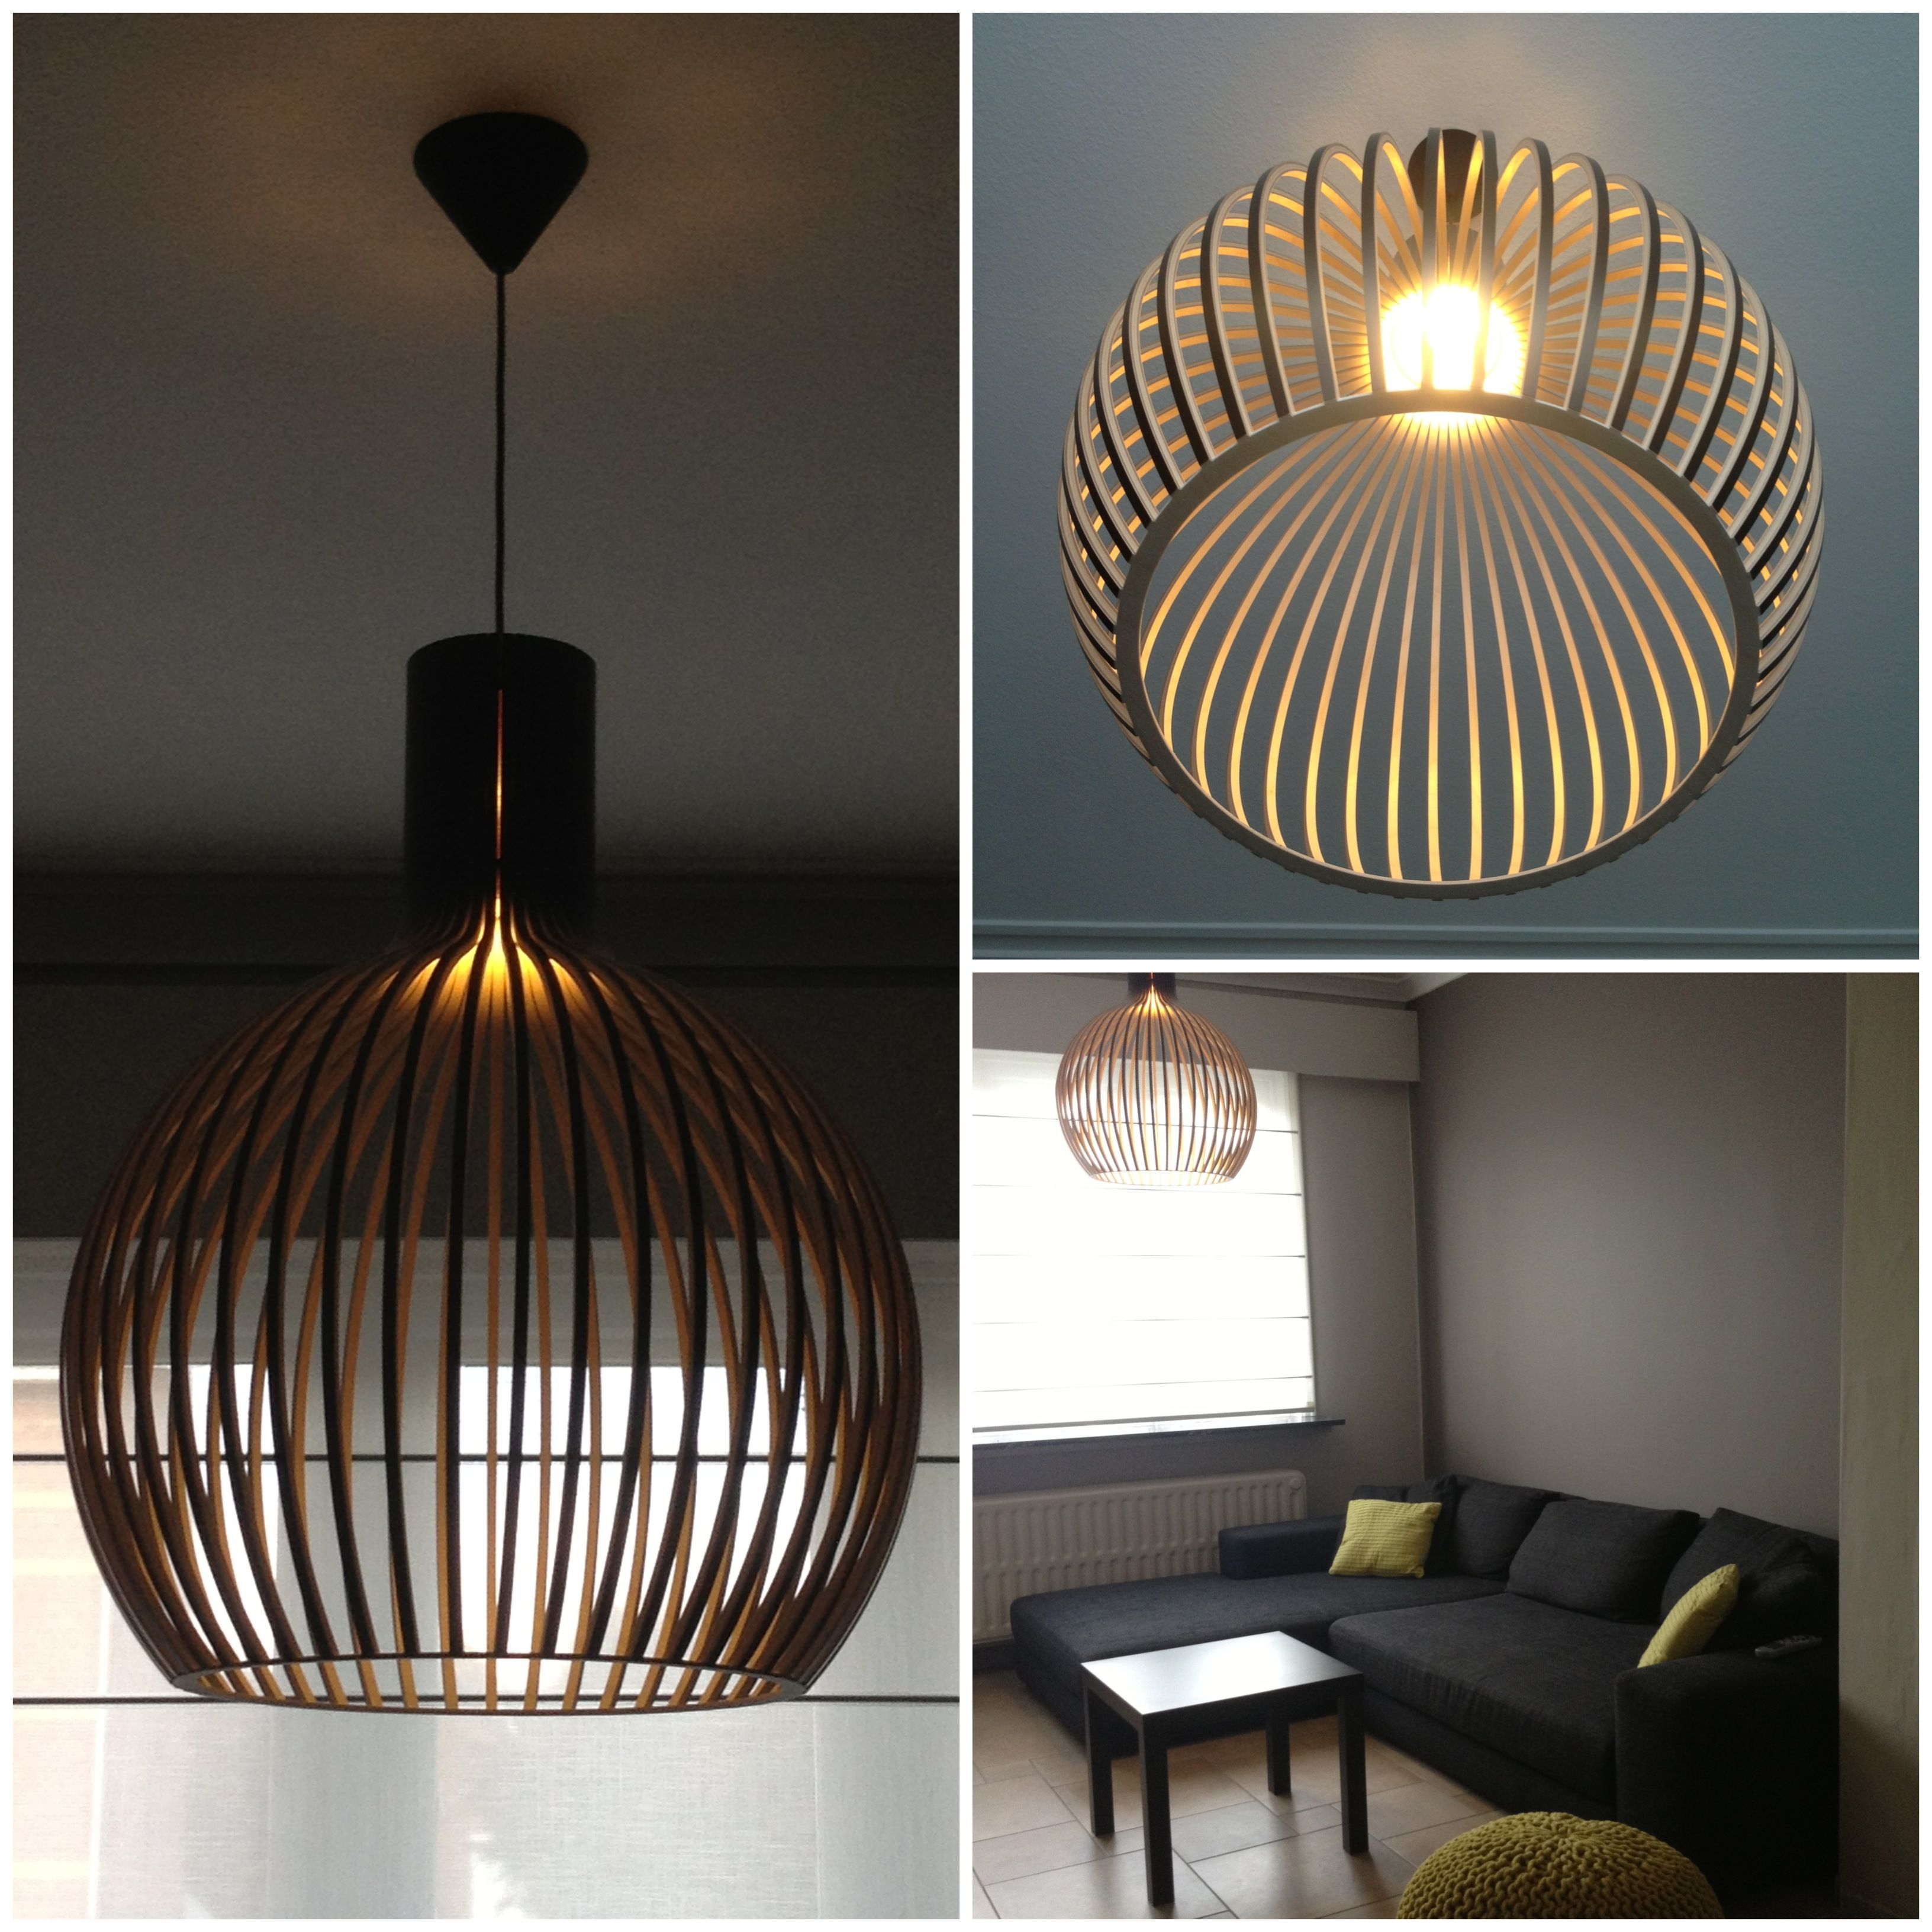 Wohnzimmer Lampe Pinterest: My Living Room Lamp - Secto Design Finnish Lamp